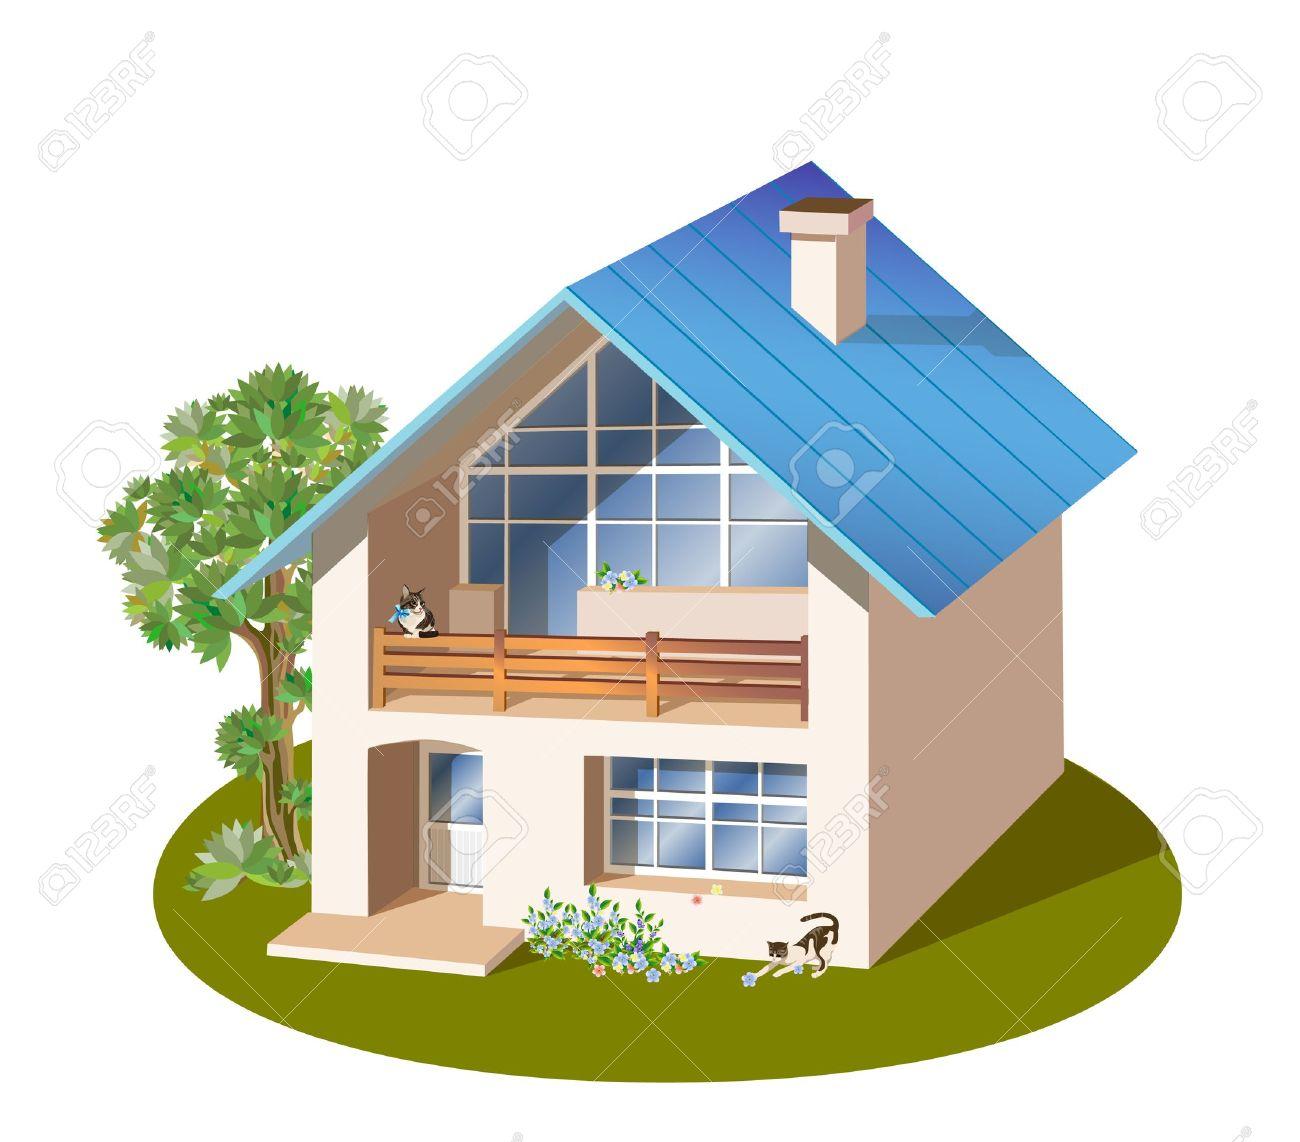 Villa clipart hause Vila Family family House net